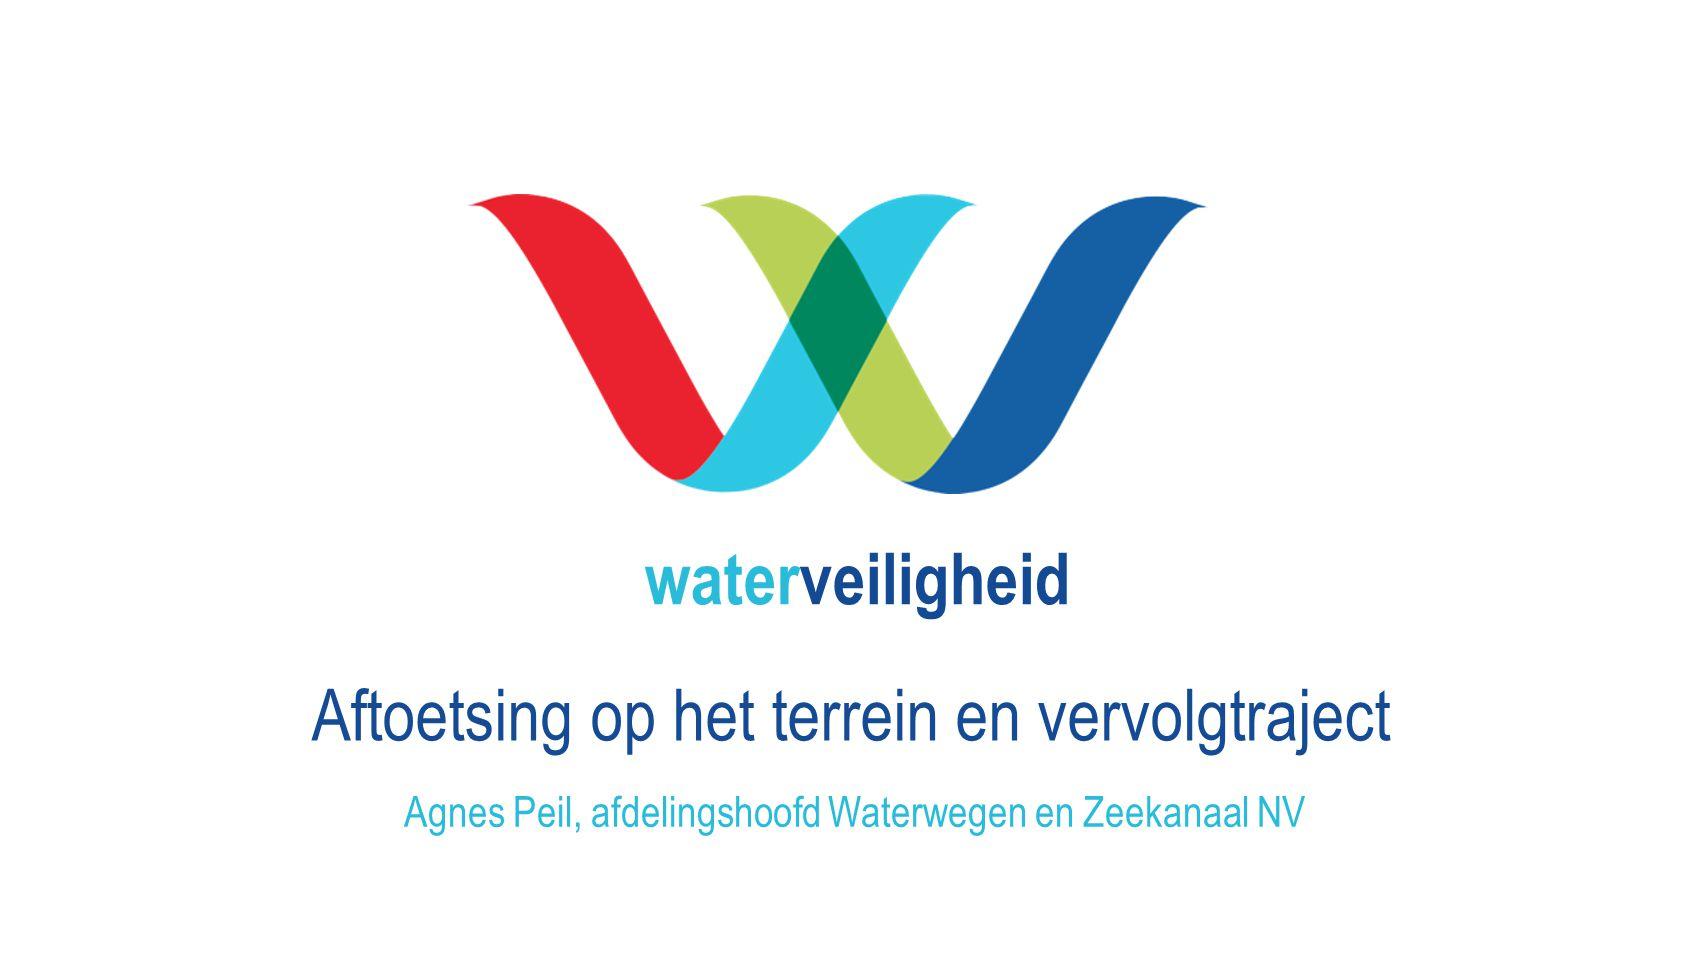 Agnes Peil, afdelingshoofd Waterwegen en Zeekanaal NV